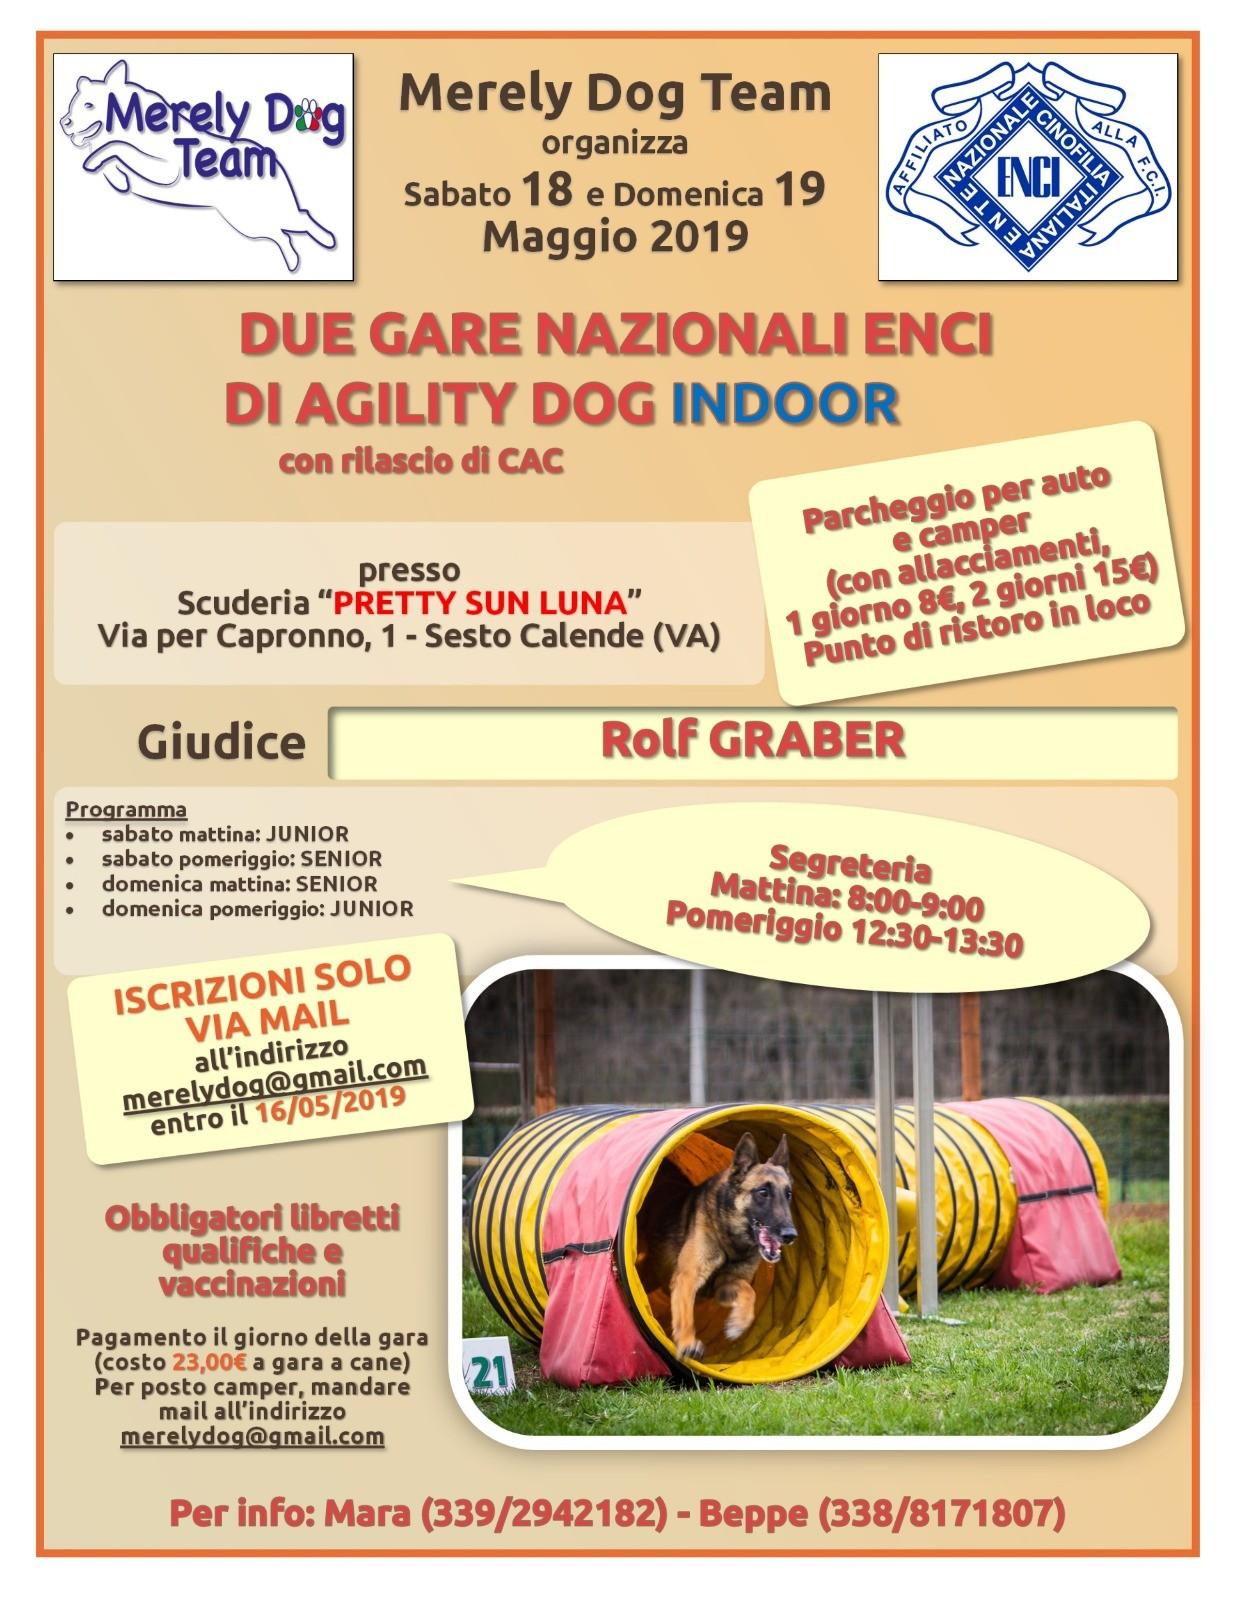 18 Maggio Merely Dog Team